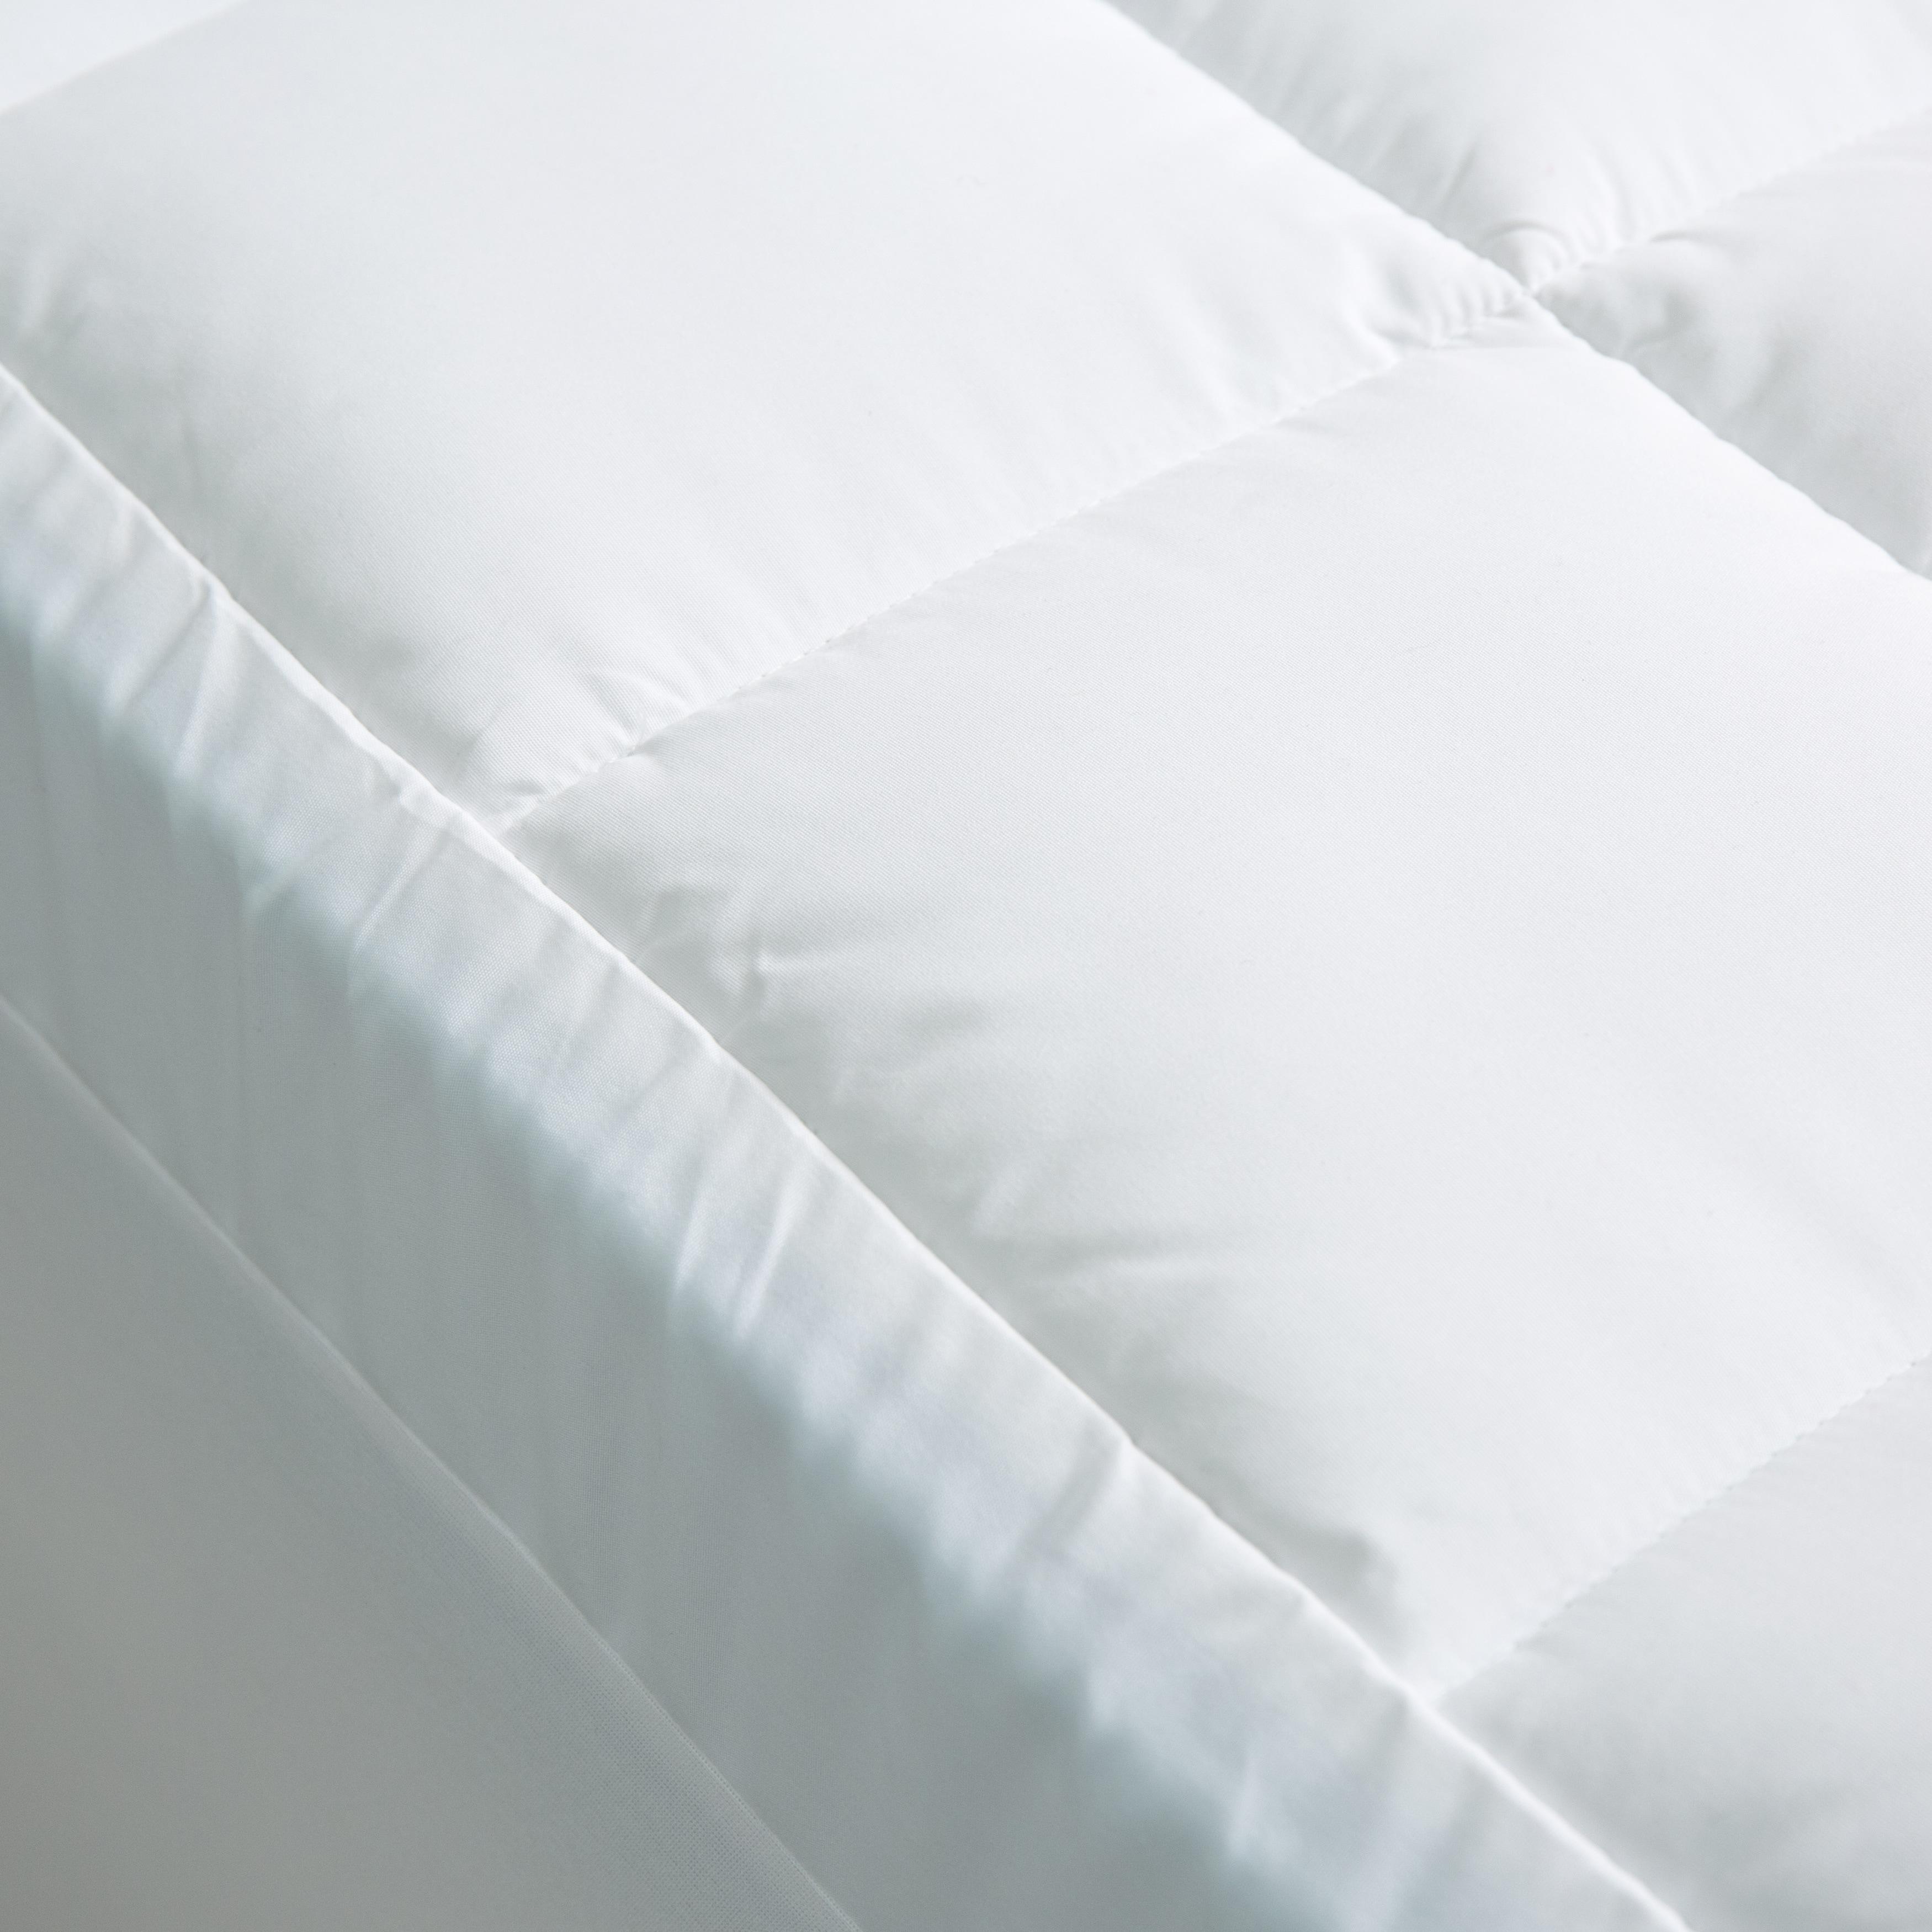 pad sizes foam quilted fiber beautyrest mattress in walmart ip com multiple memory topper